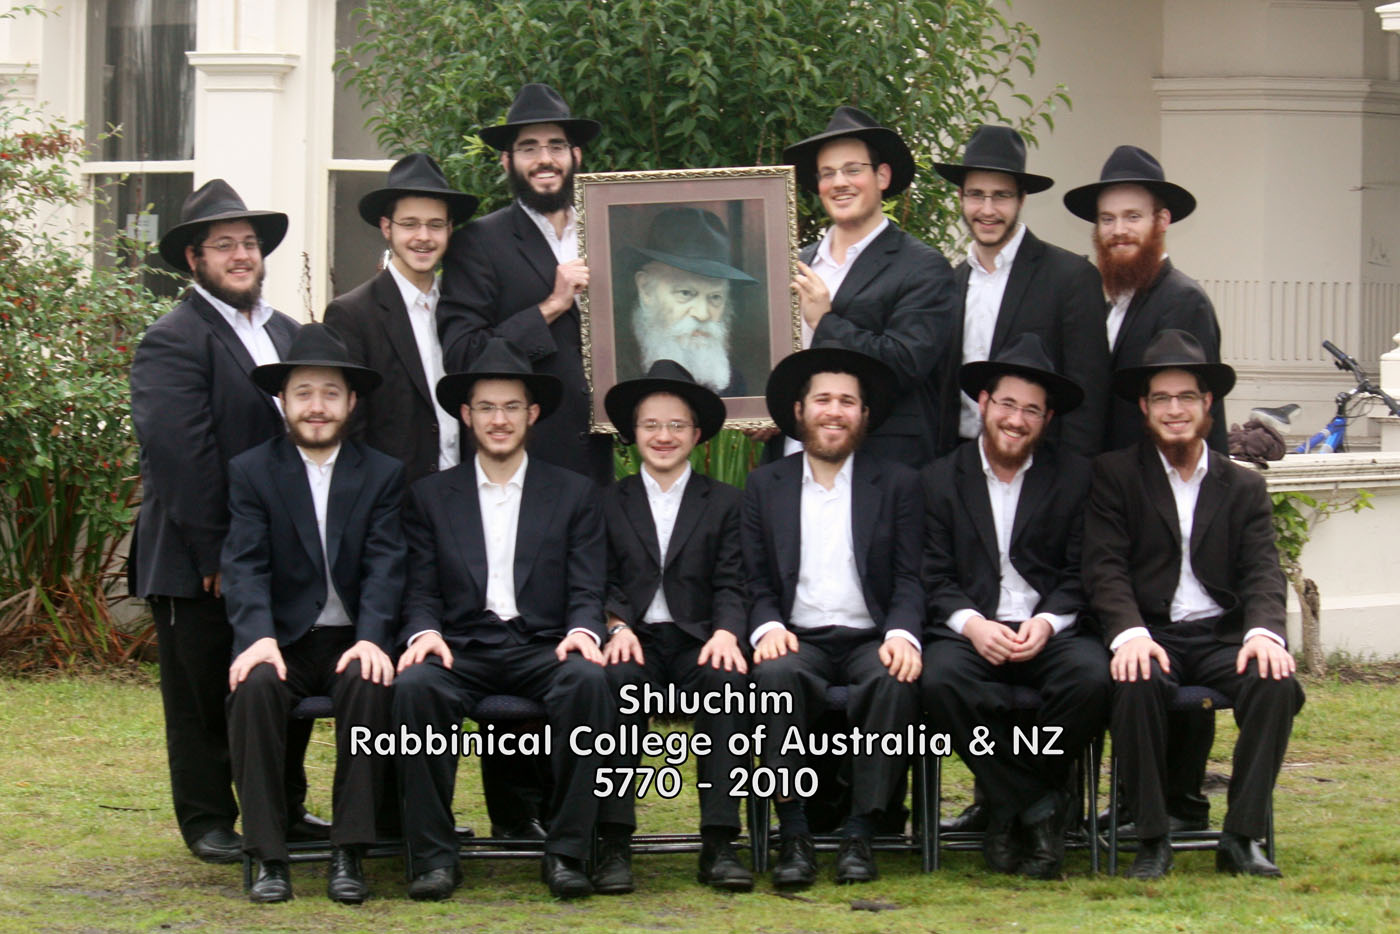 Shluchim - Rabbinical College of Australia & NZ - 5770